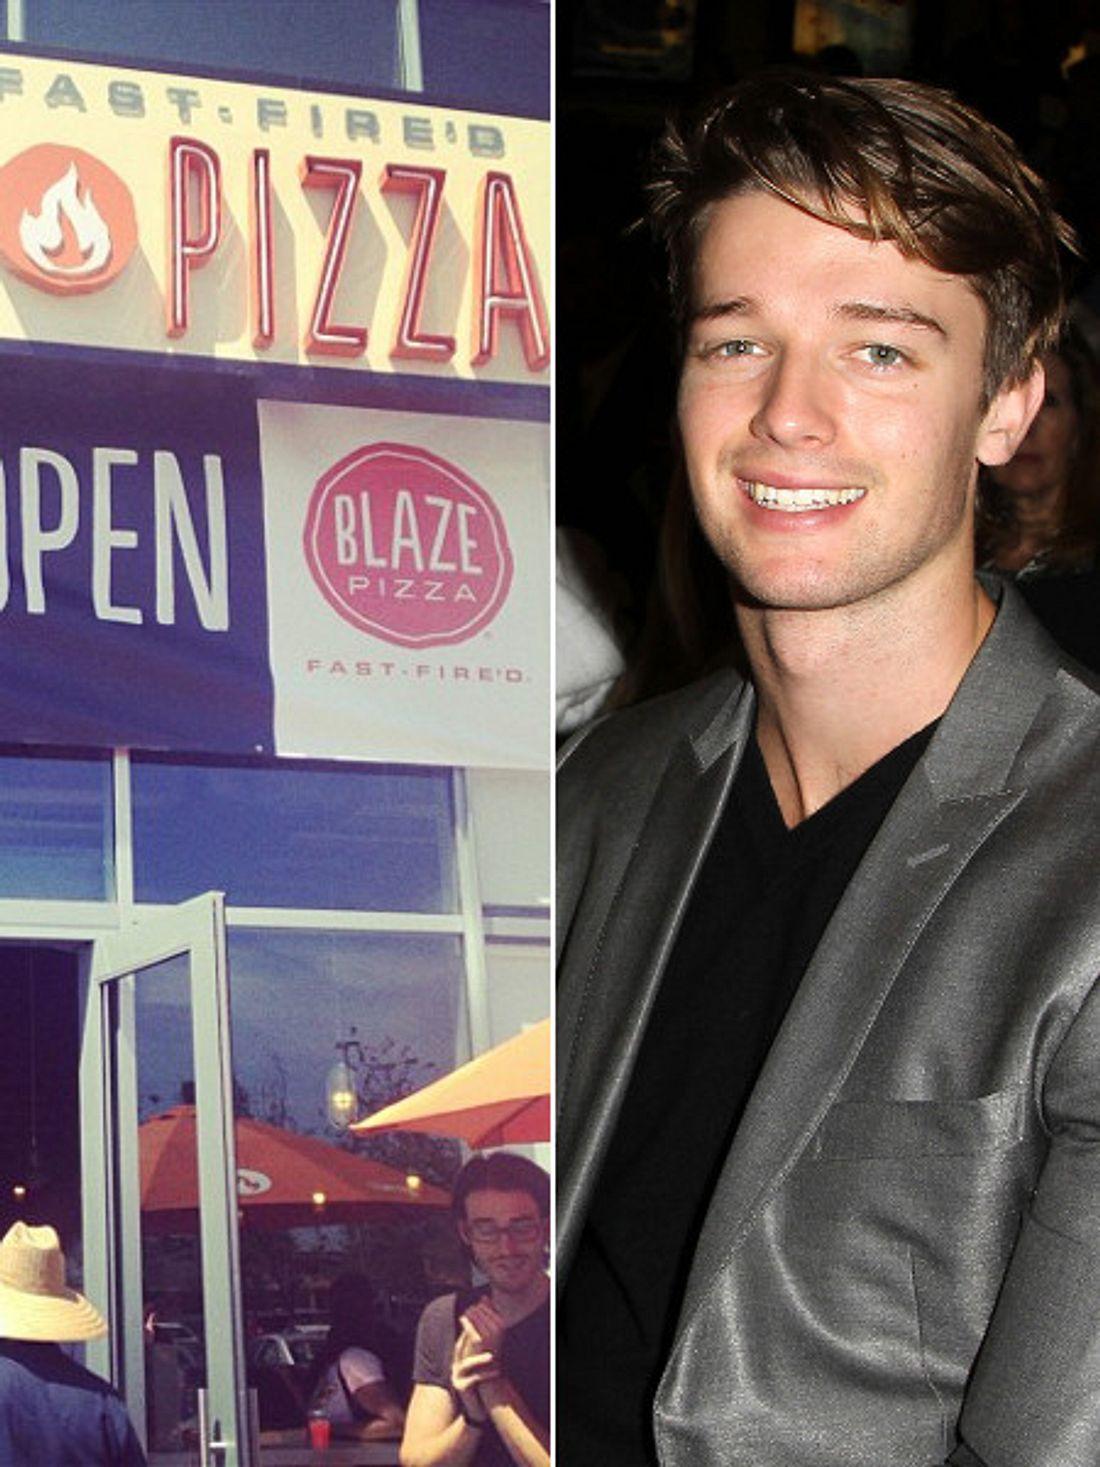 Patrick Schwarzenegger besitzt ein Pizza-Restaurant.